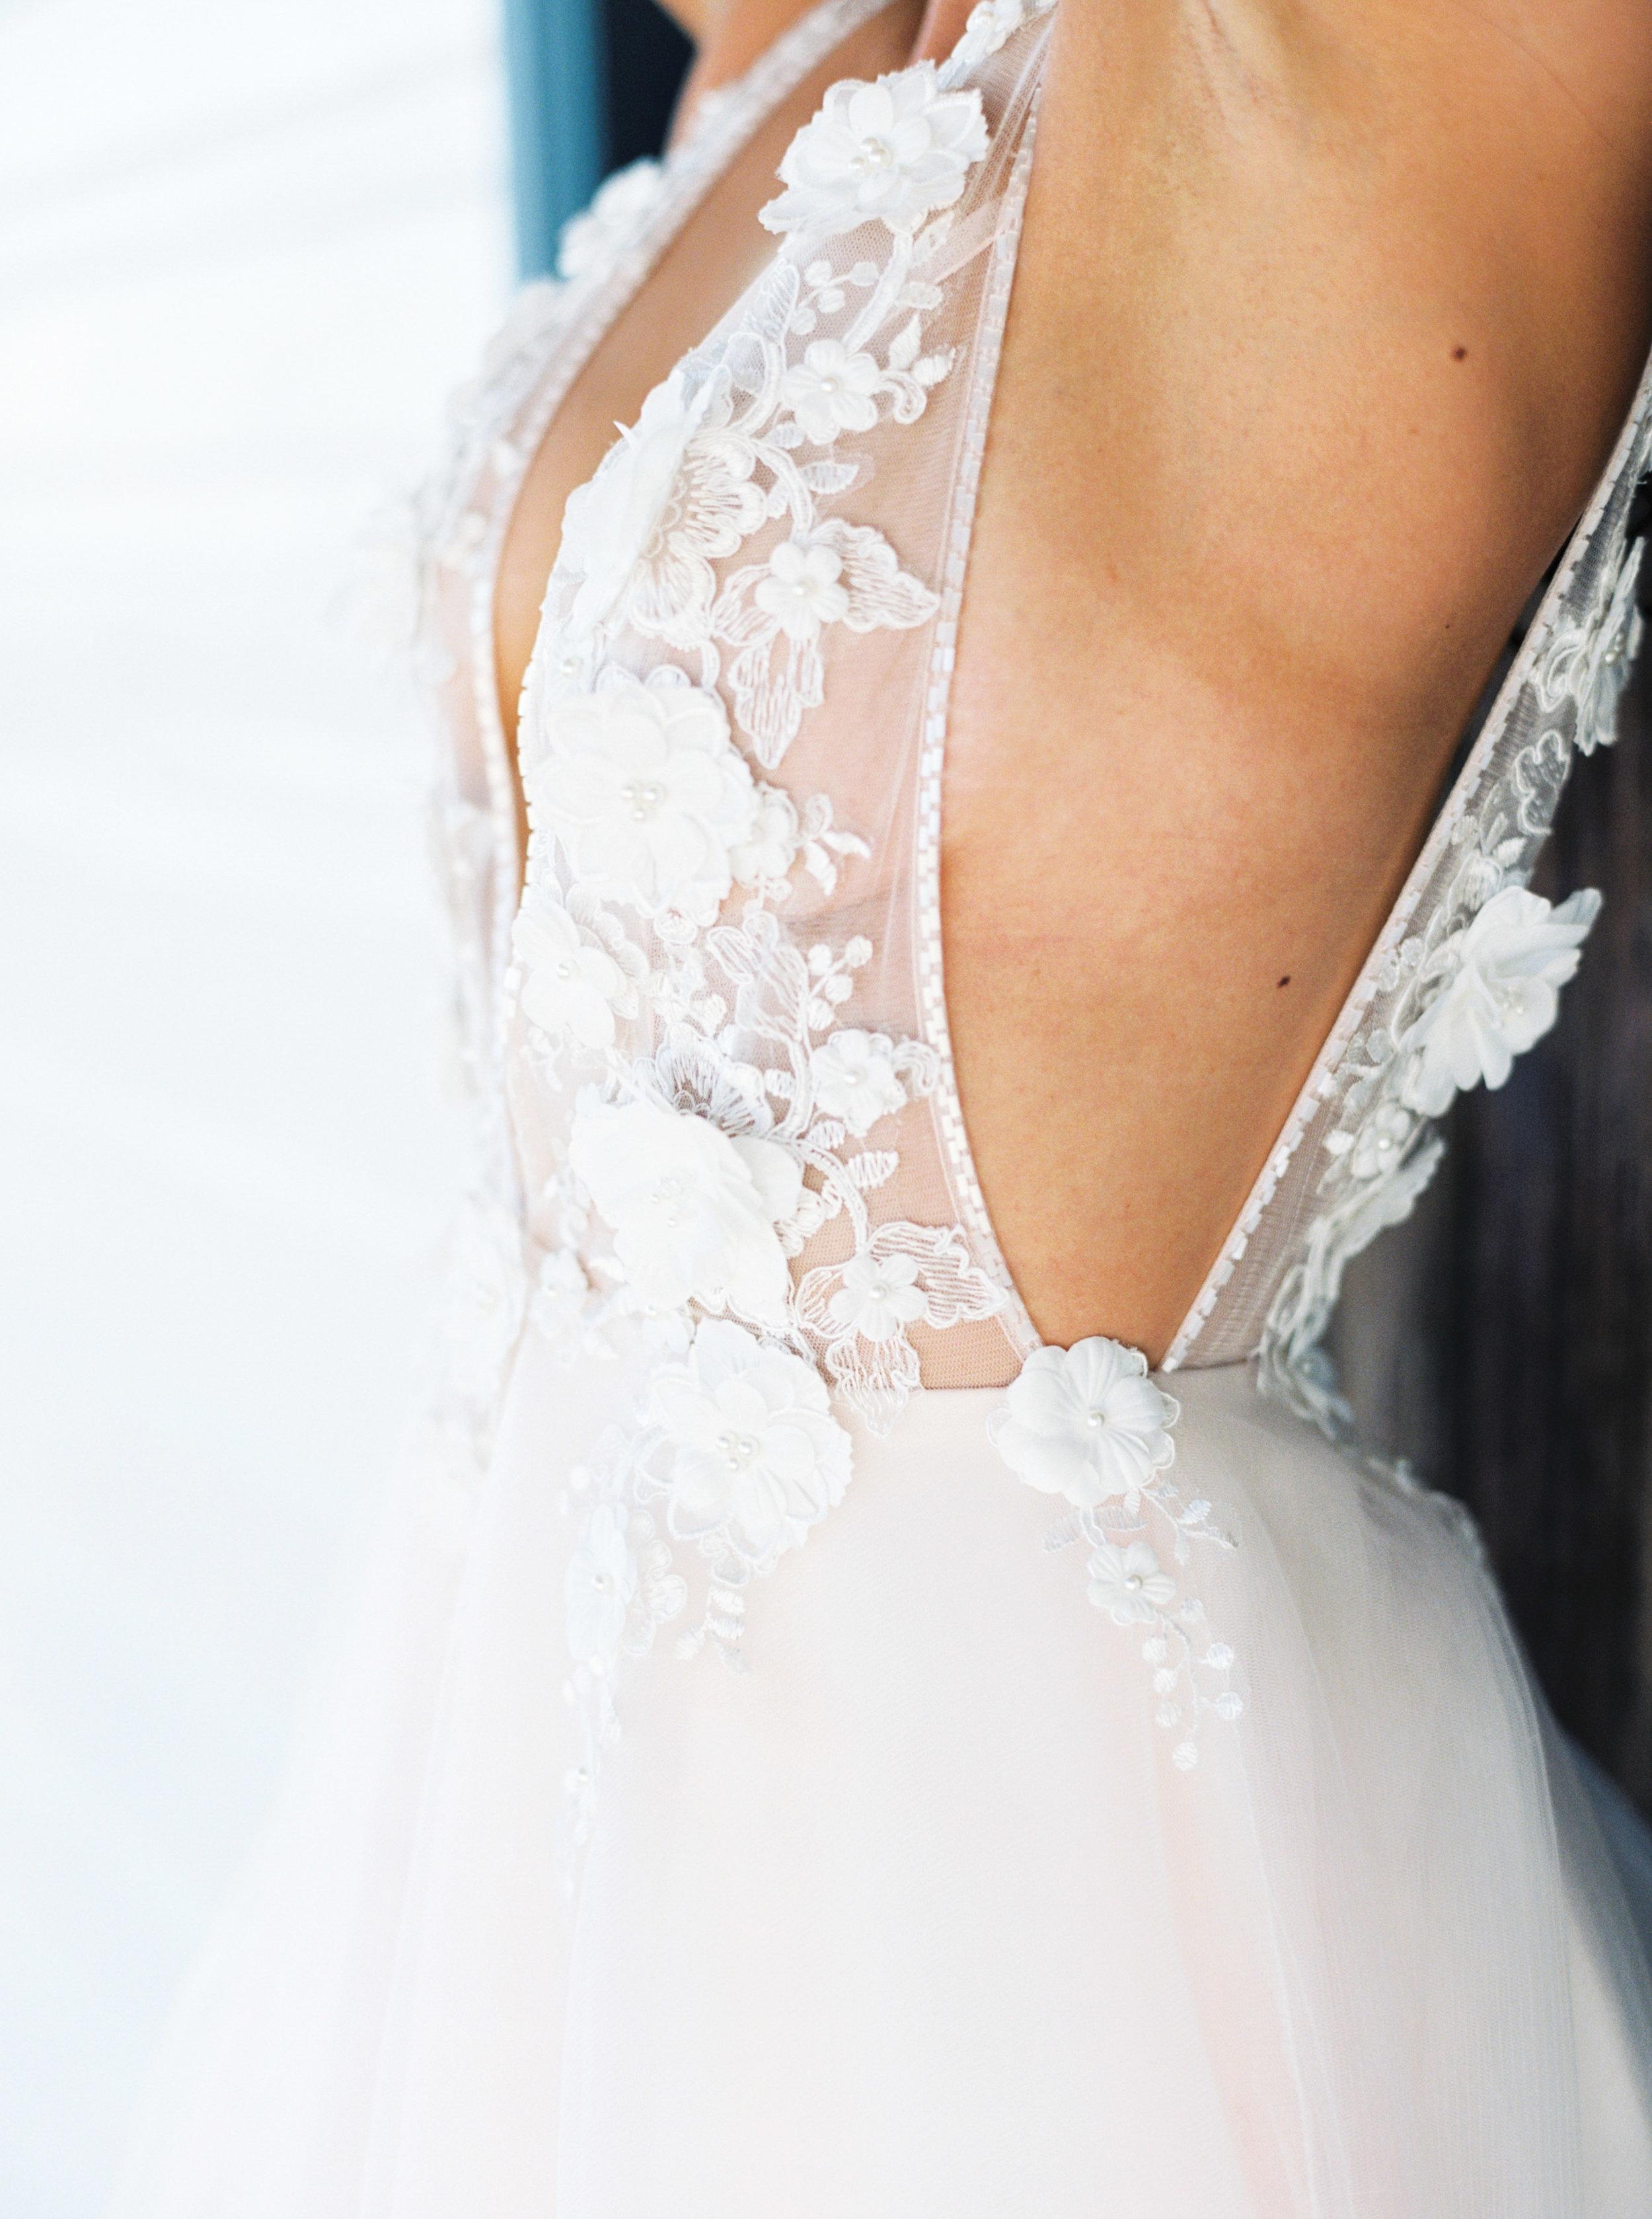 00026- Tamworth NSW Wedding Photographer Sheri McMahon-2.jpg